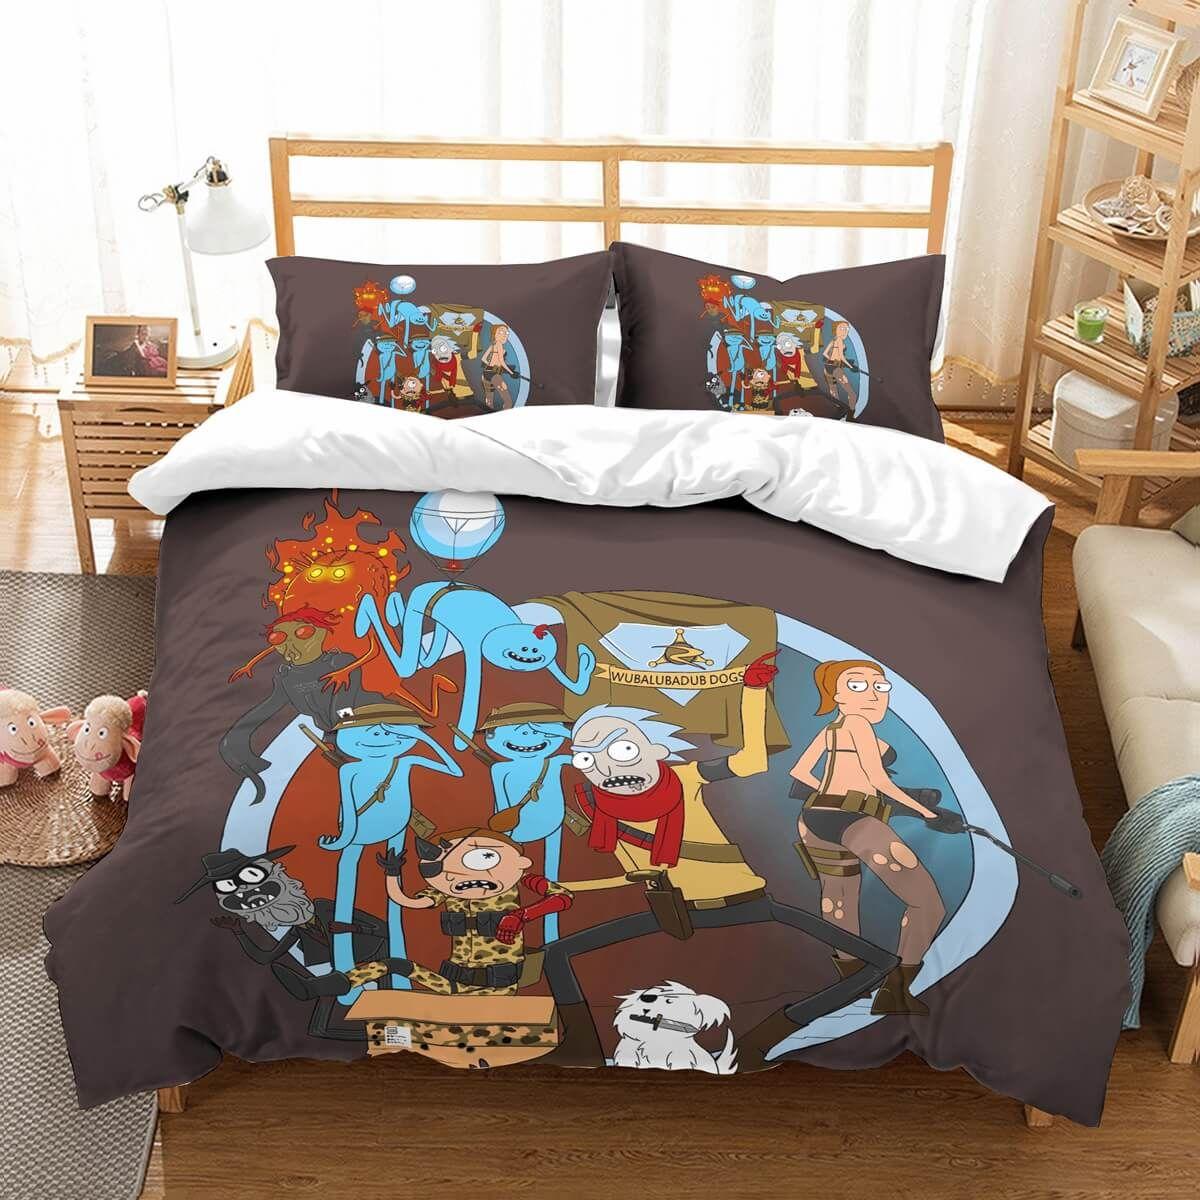 3D Customize Rick And Morty Bedding Set Duvet Cover Set